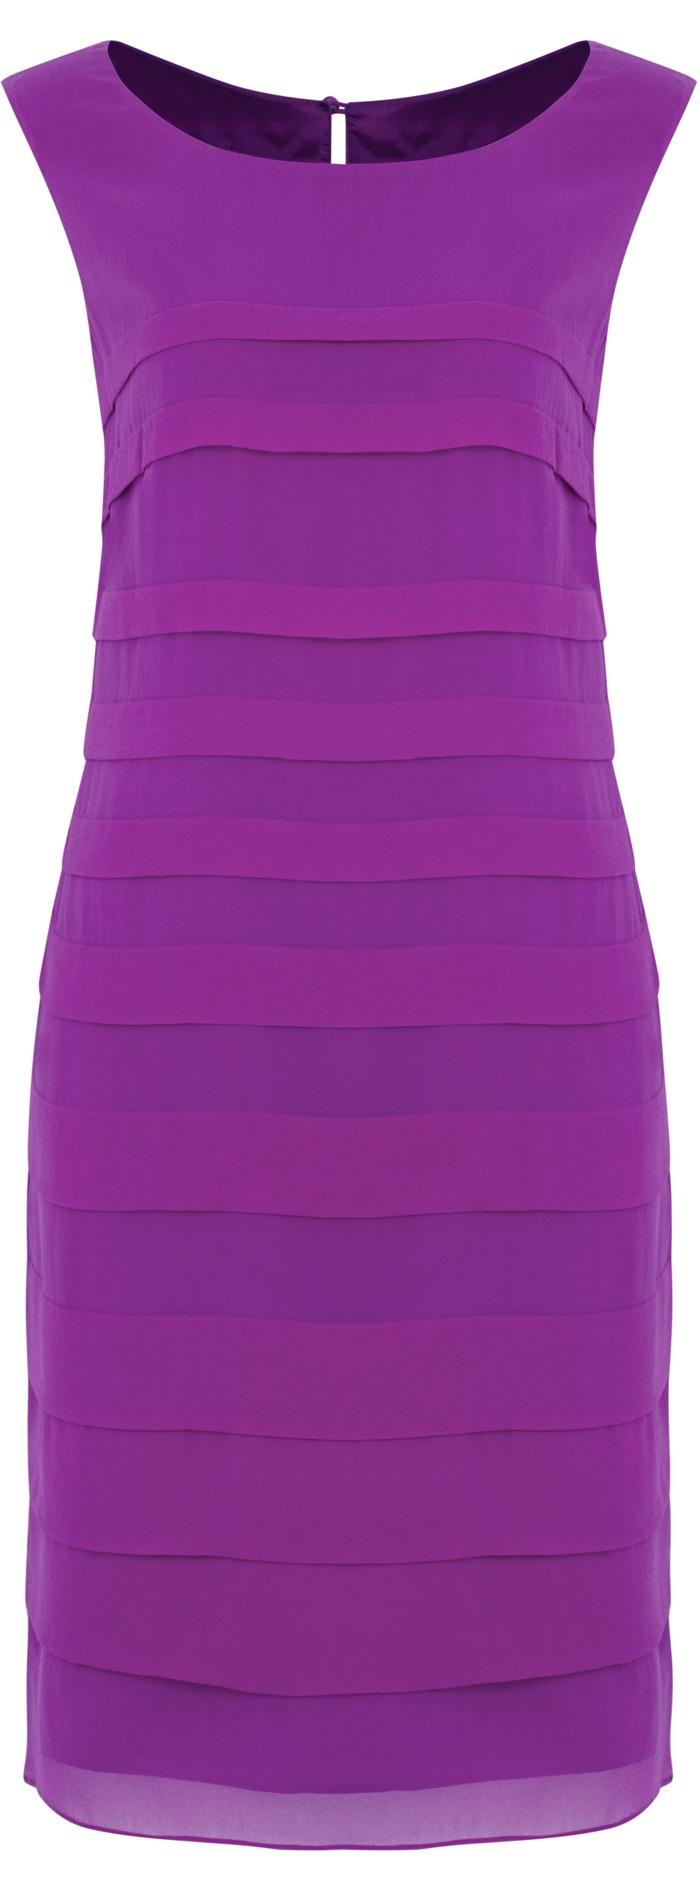 Should a bride wear a purple wedding dress? - monsoon prshots - CLICK TO READ: http://boomerinas.com/2012/03/should-a-bride-wear-a-purple-wedding-dress/